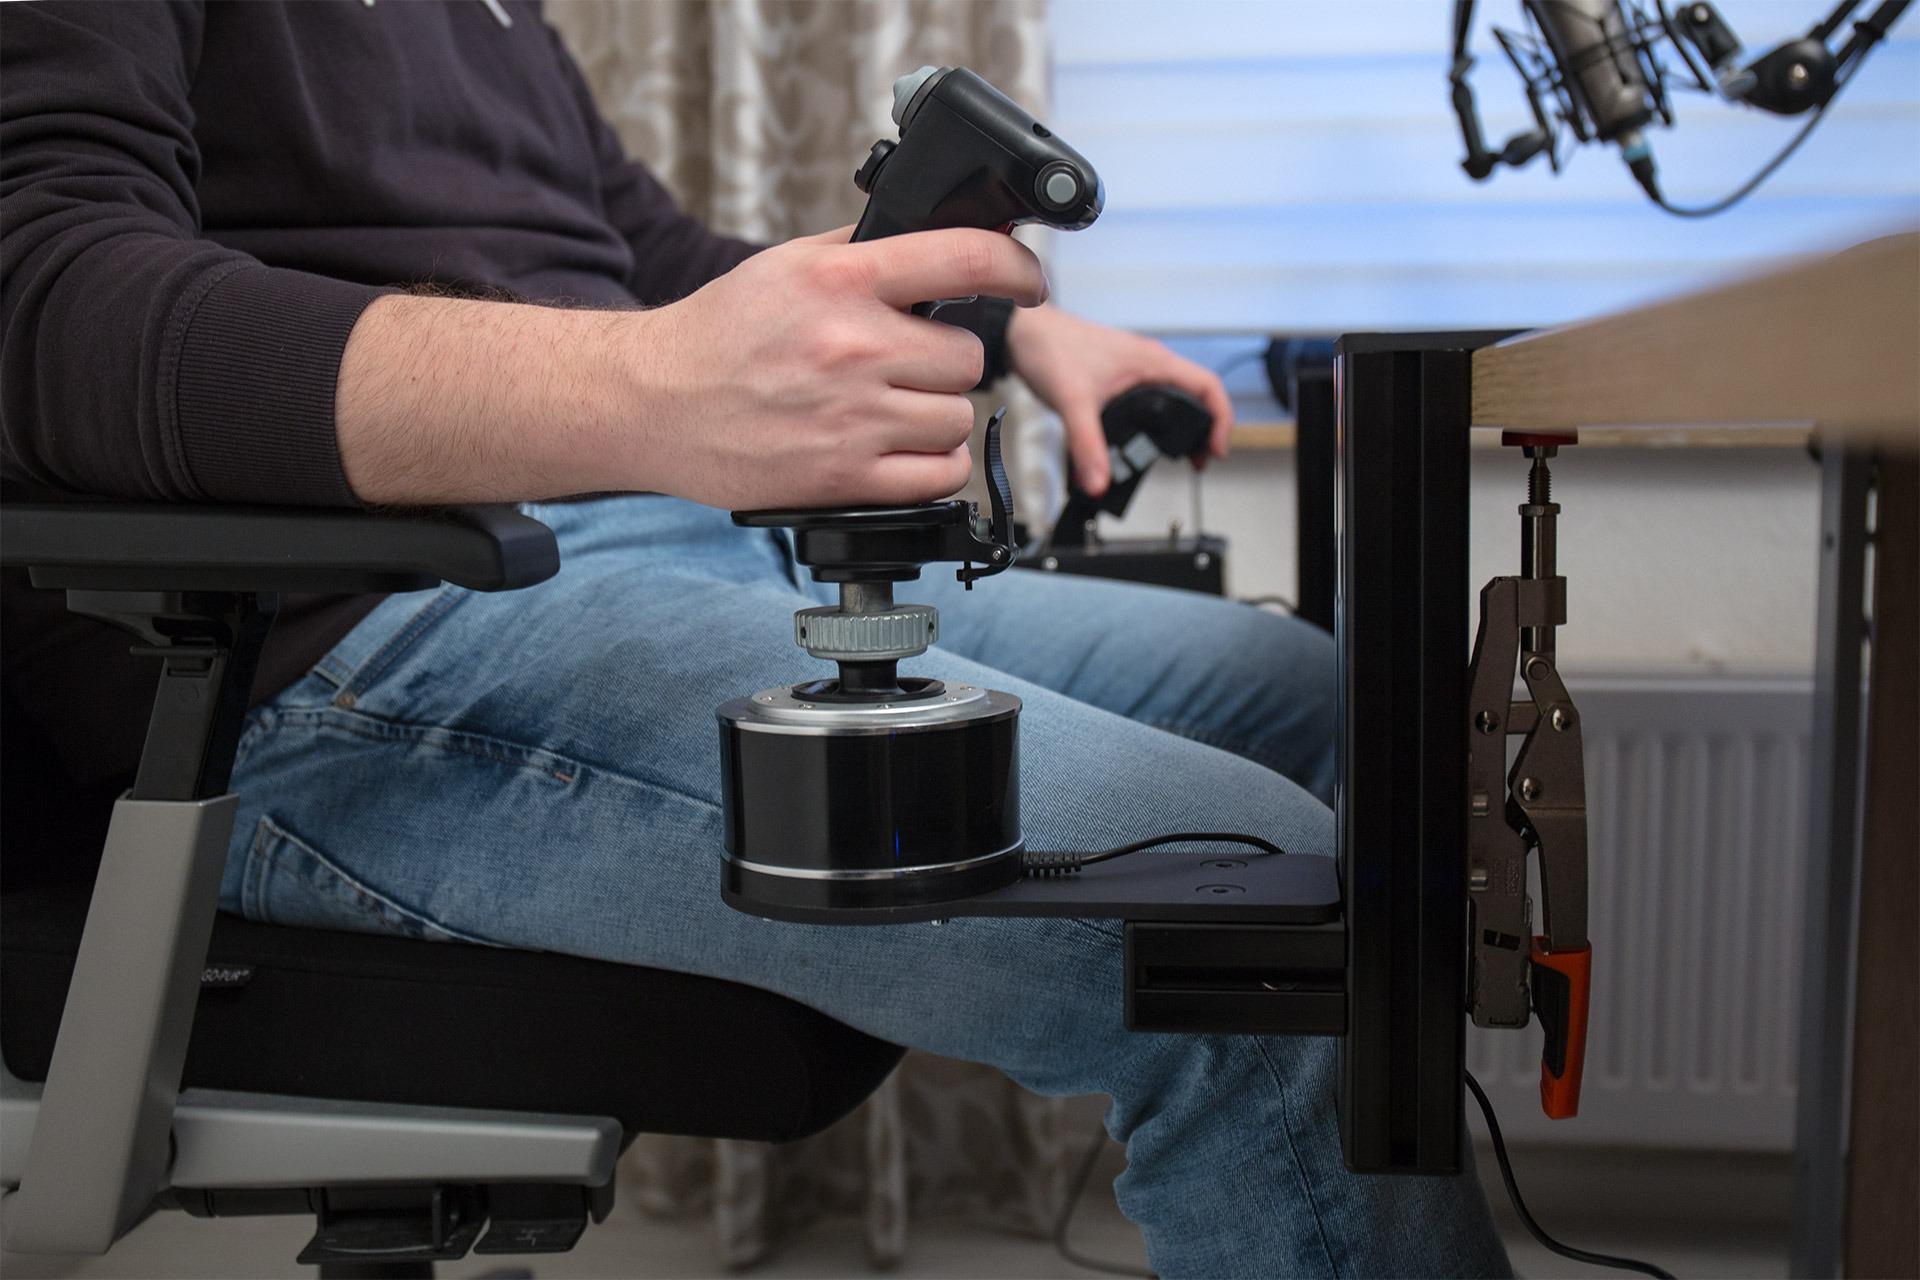 Hotas Joystick Table Mount Monster Tech